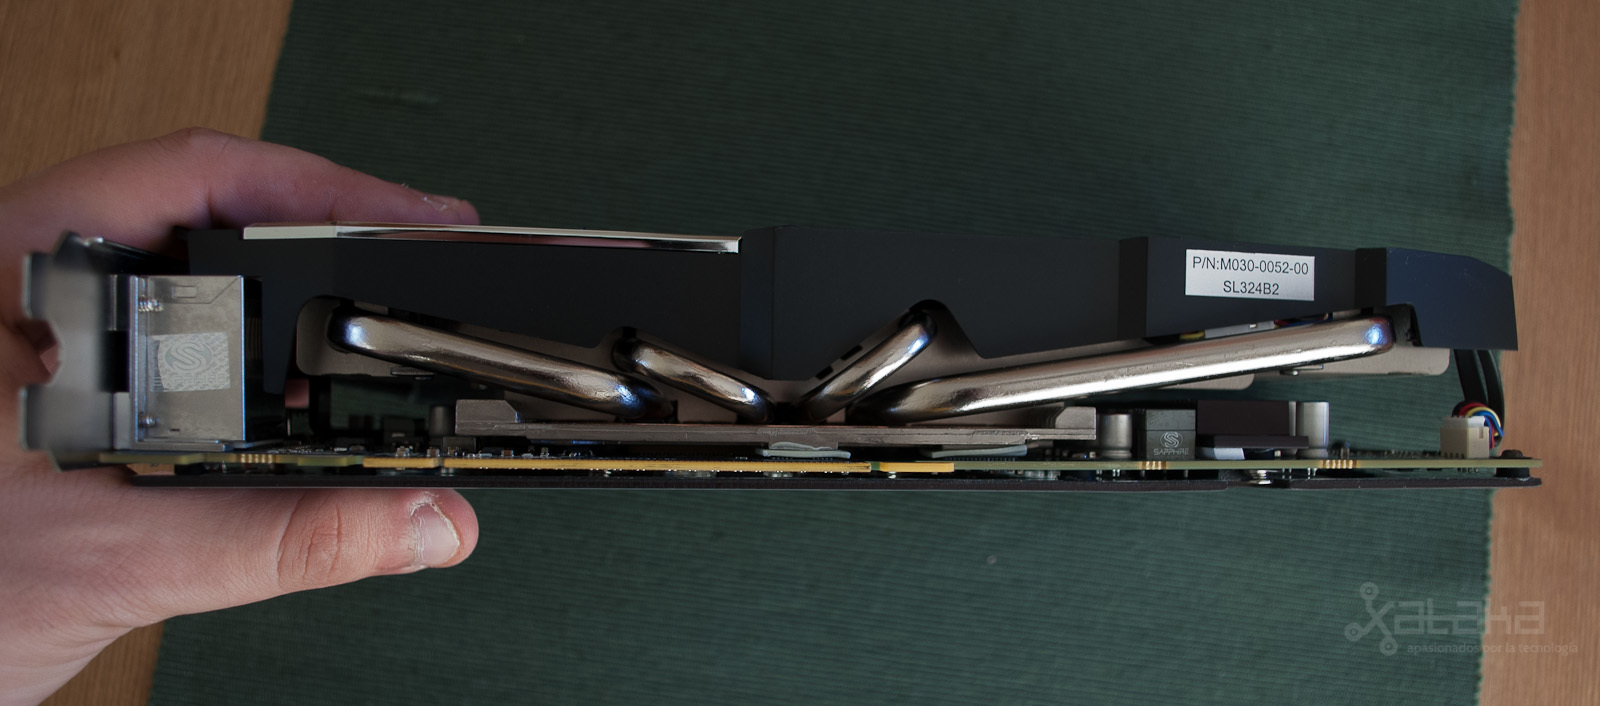 Foto de AMD R9 280X, análisis (8/14)